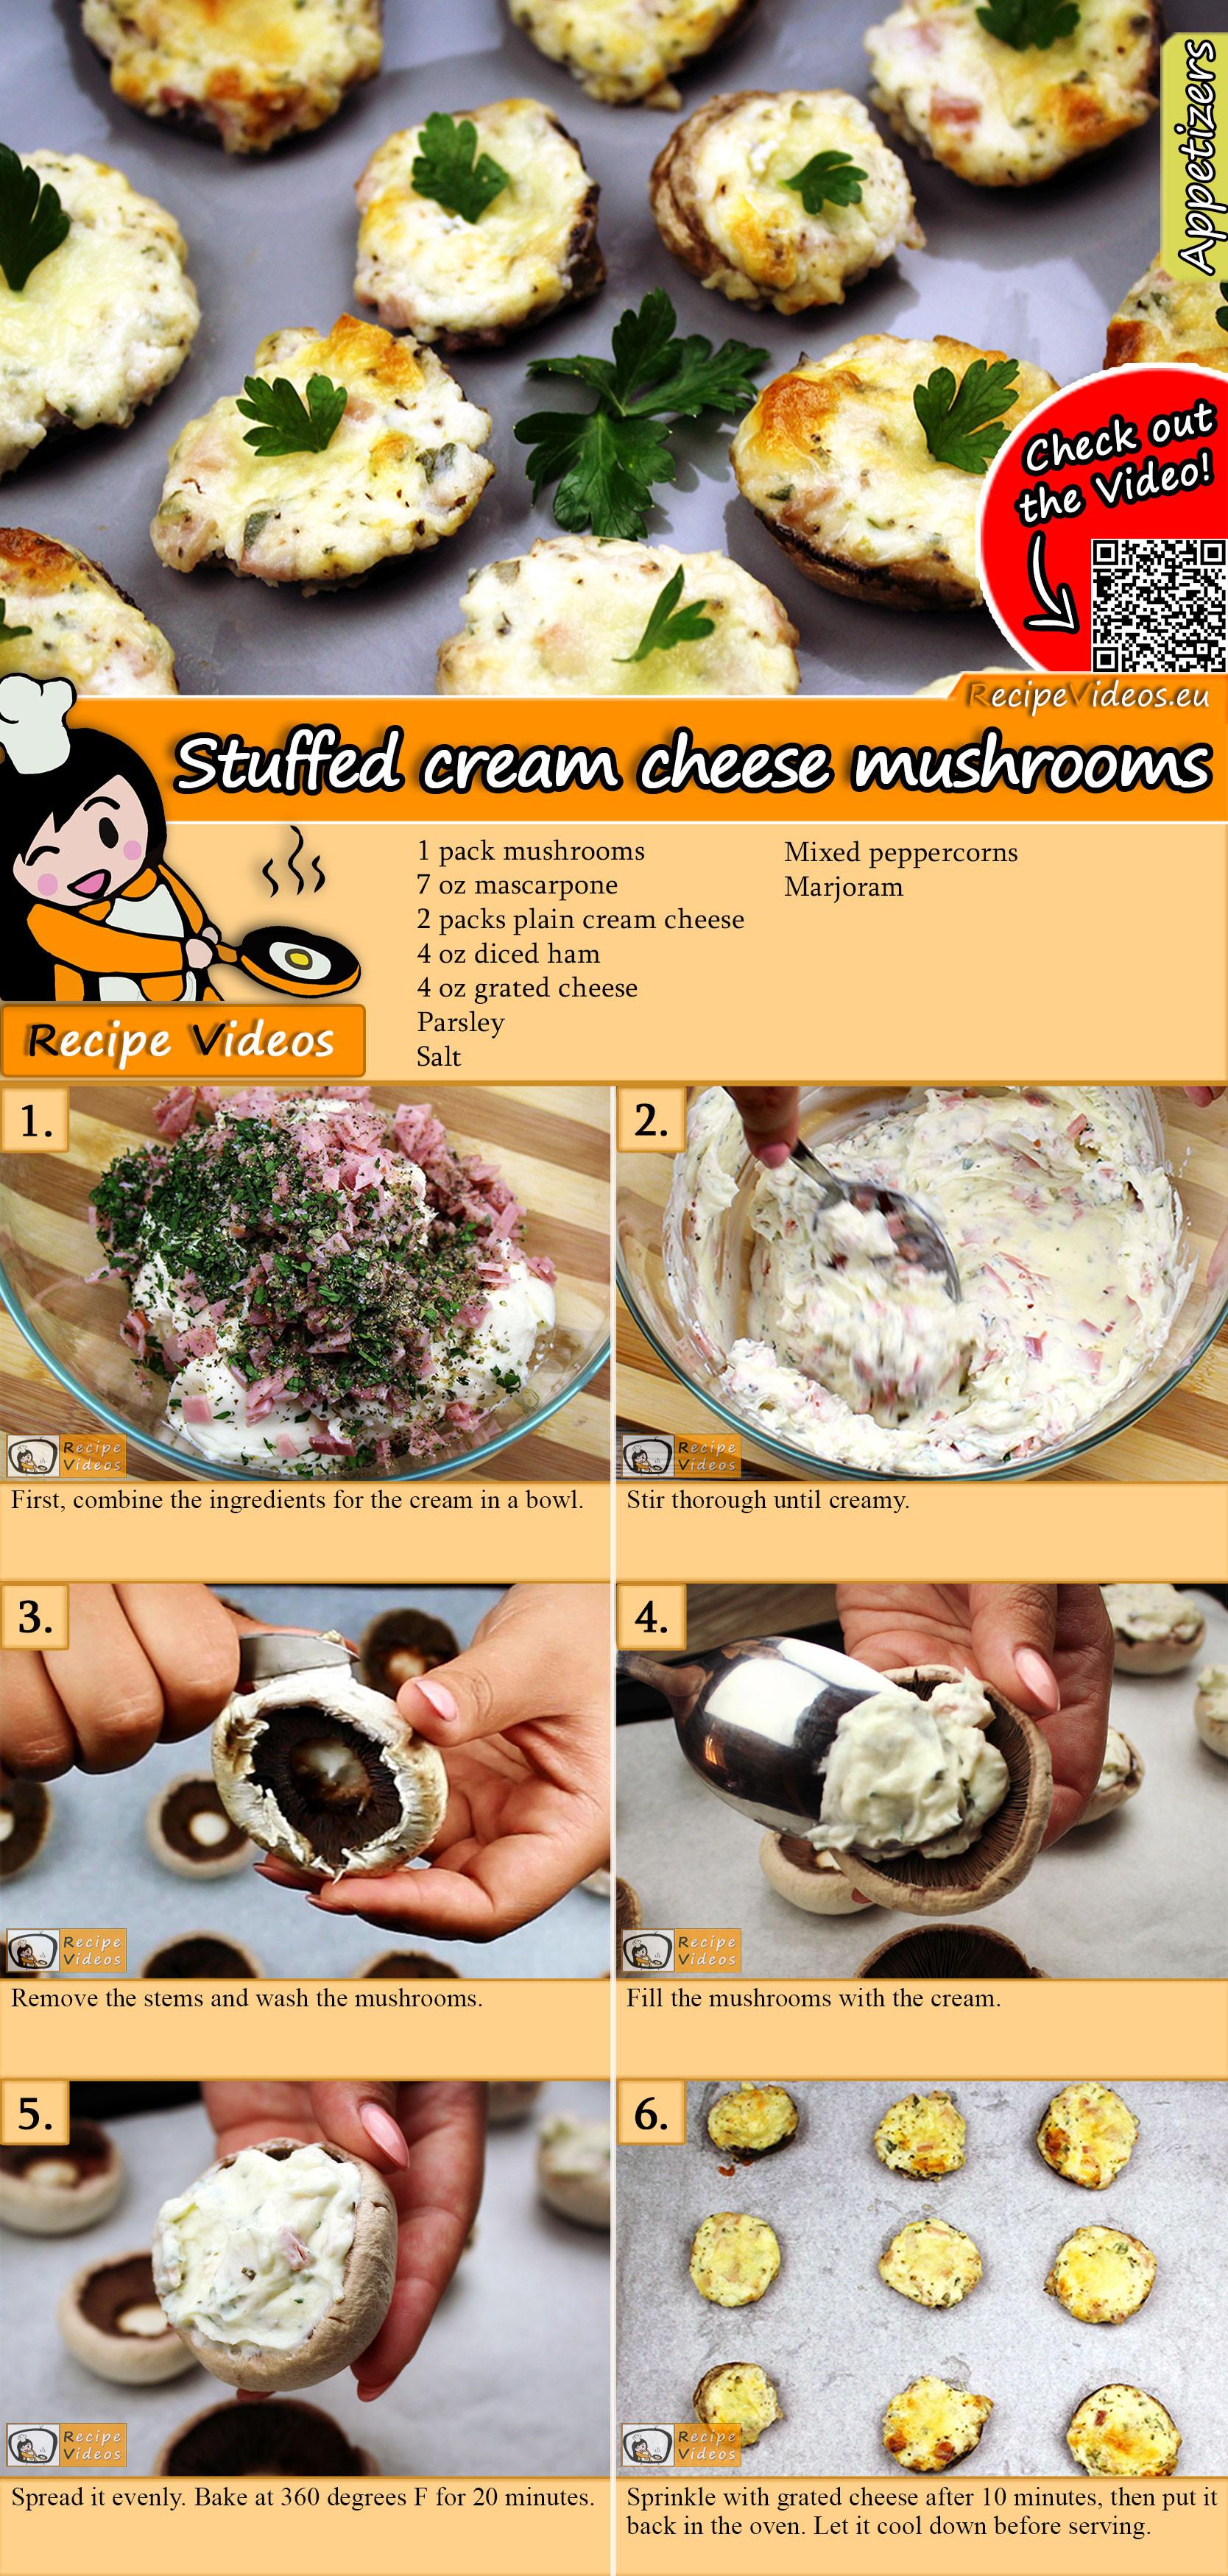 Stuffed cream cheese mushrooms recipe with video